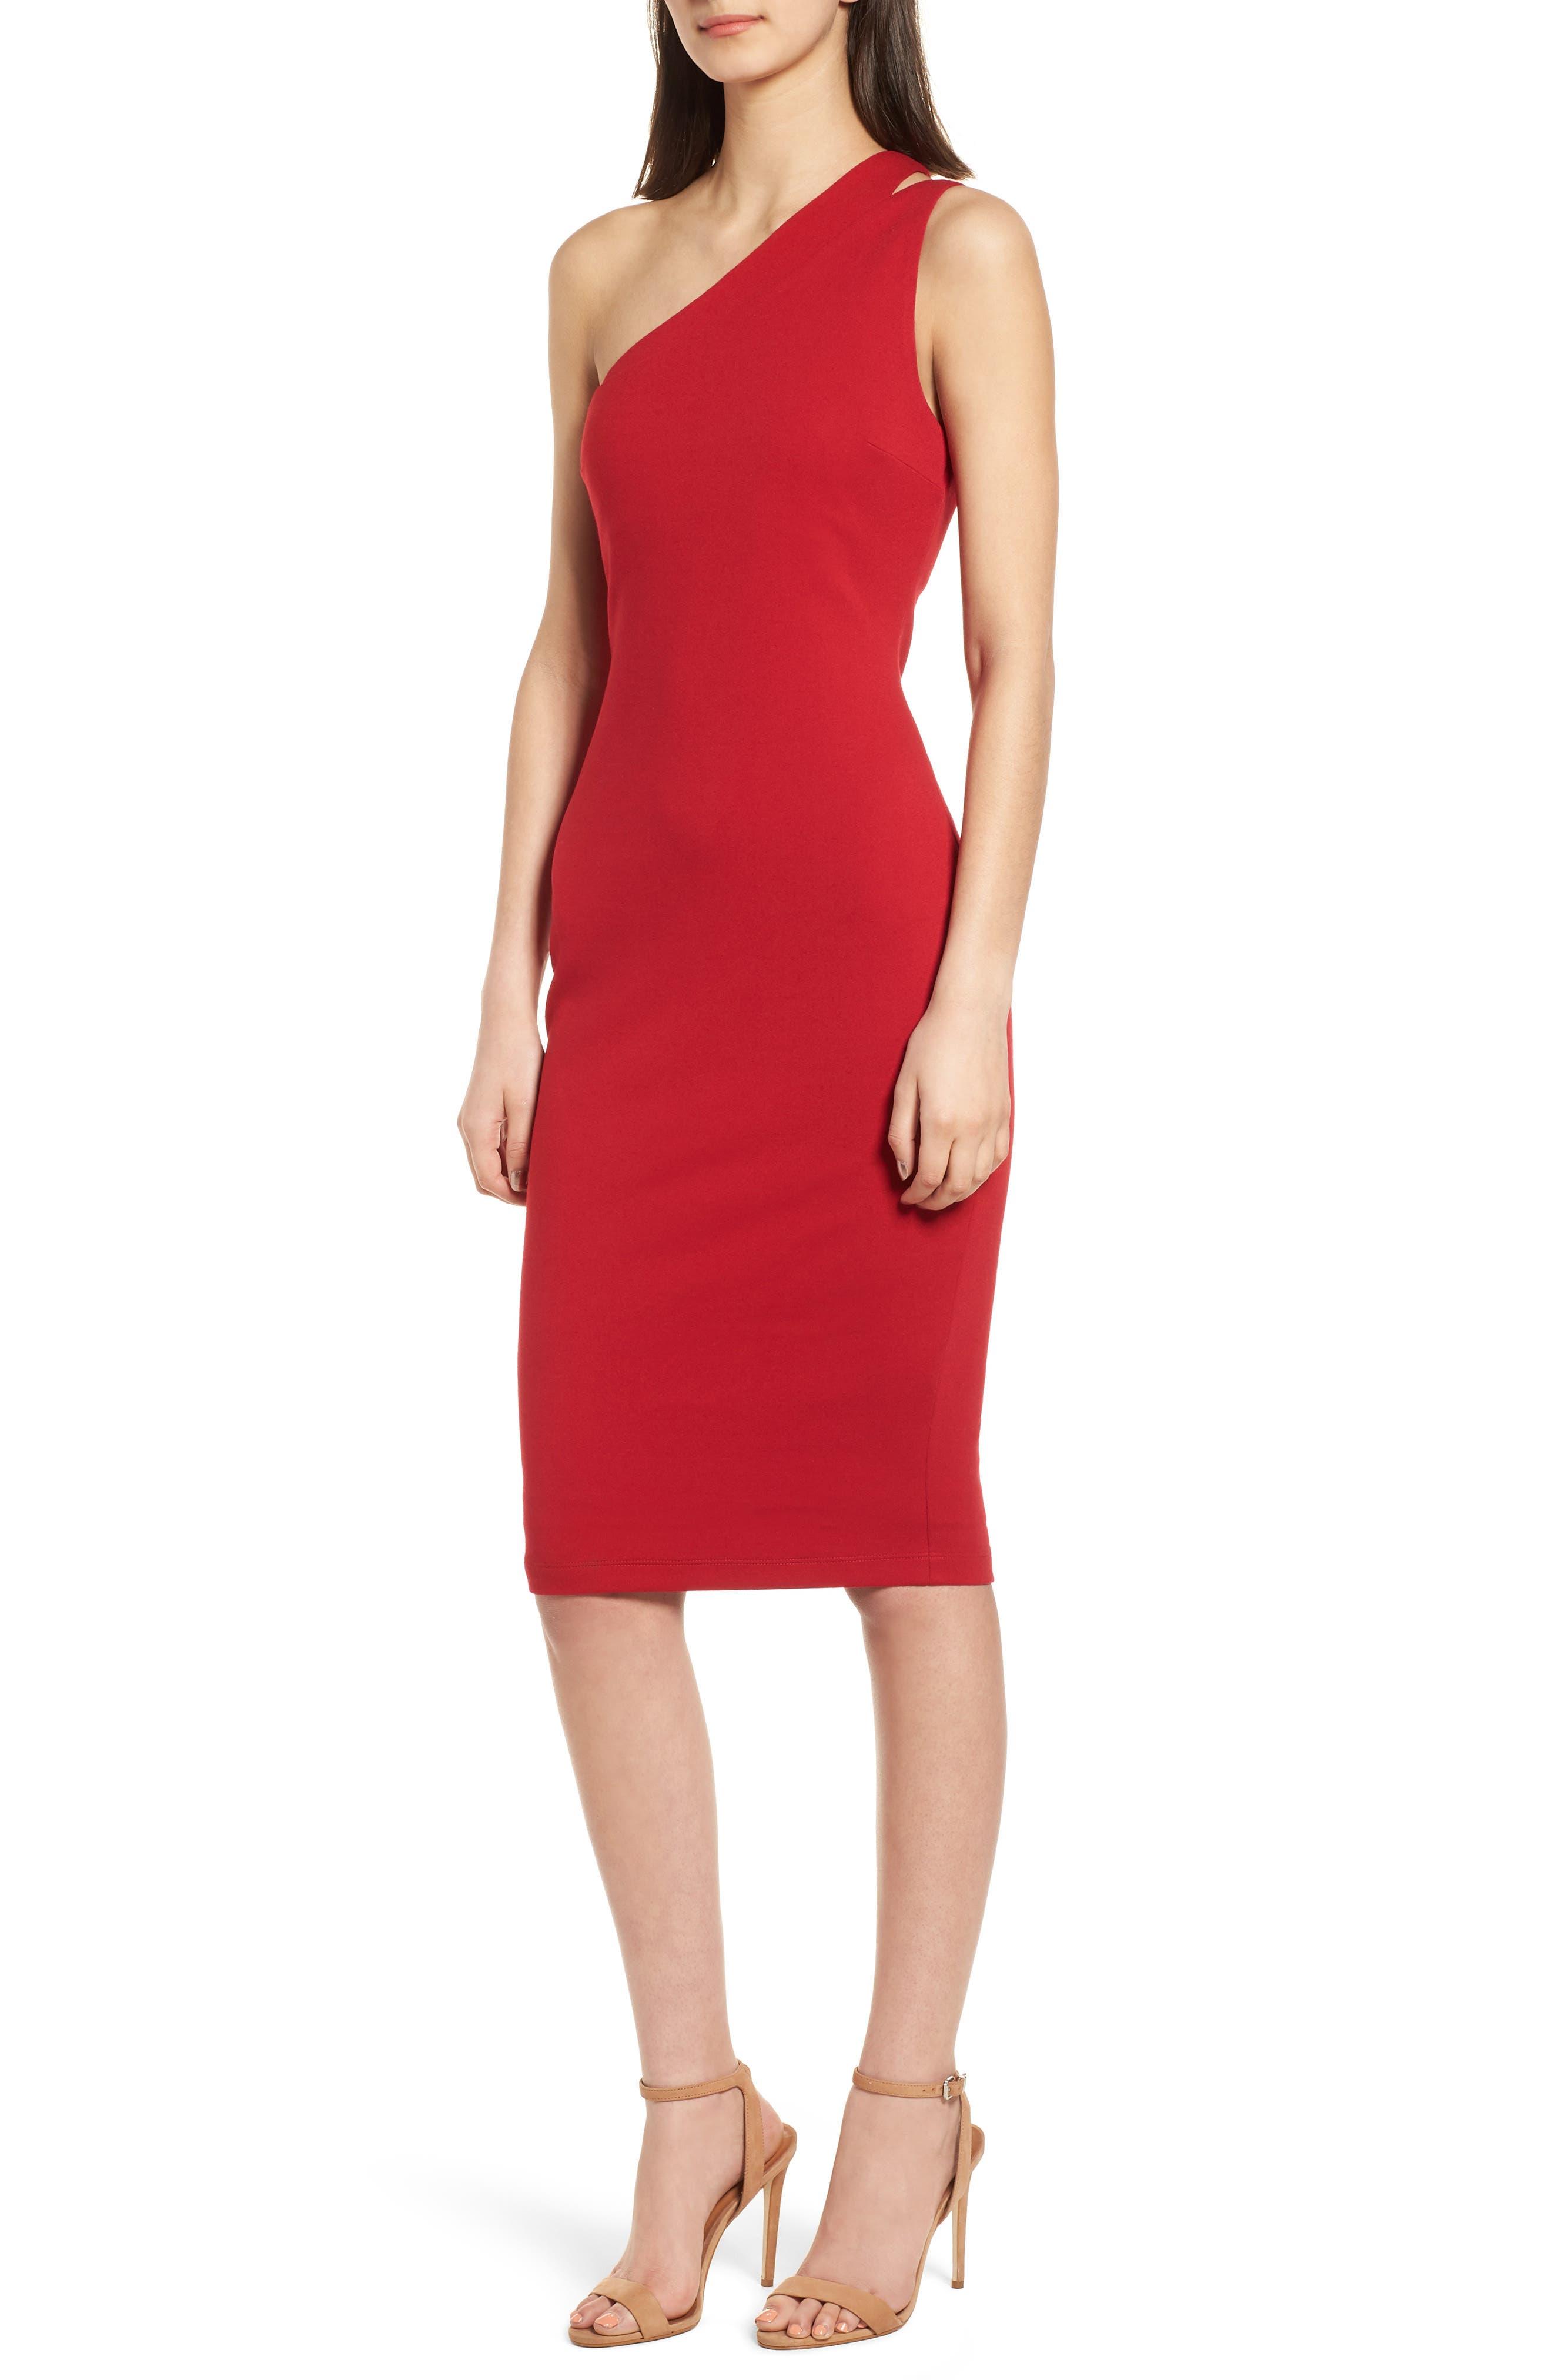 Bailey 44 Sidewinder One-Shoulder Body-Con Dress